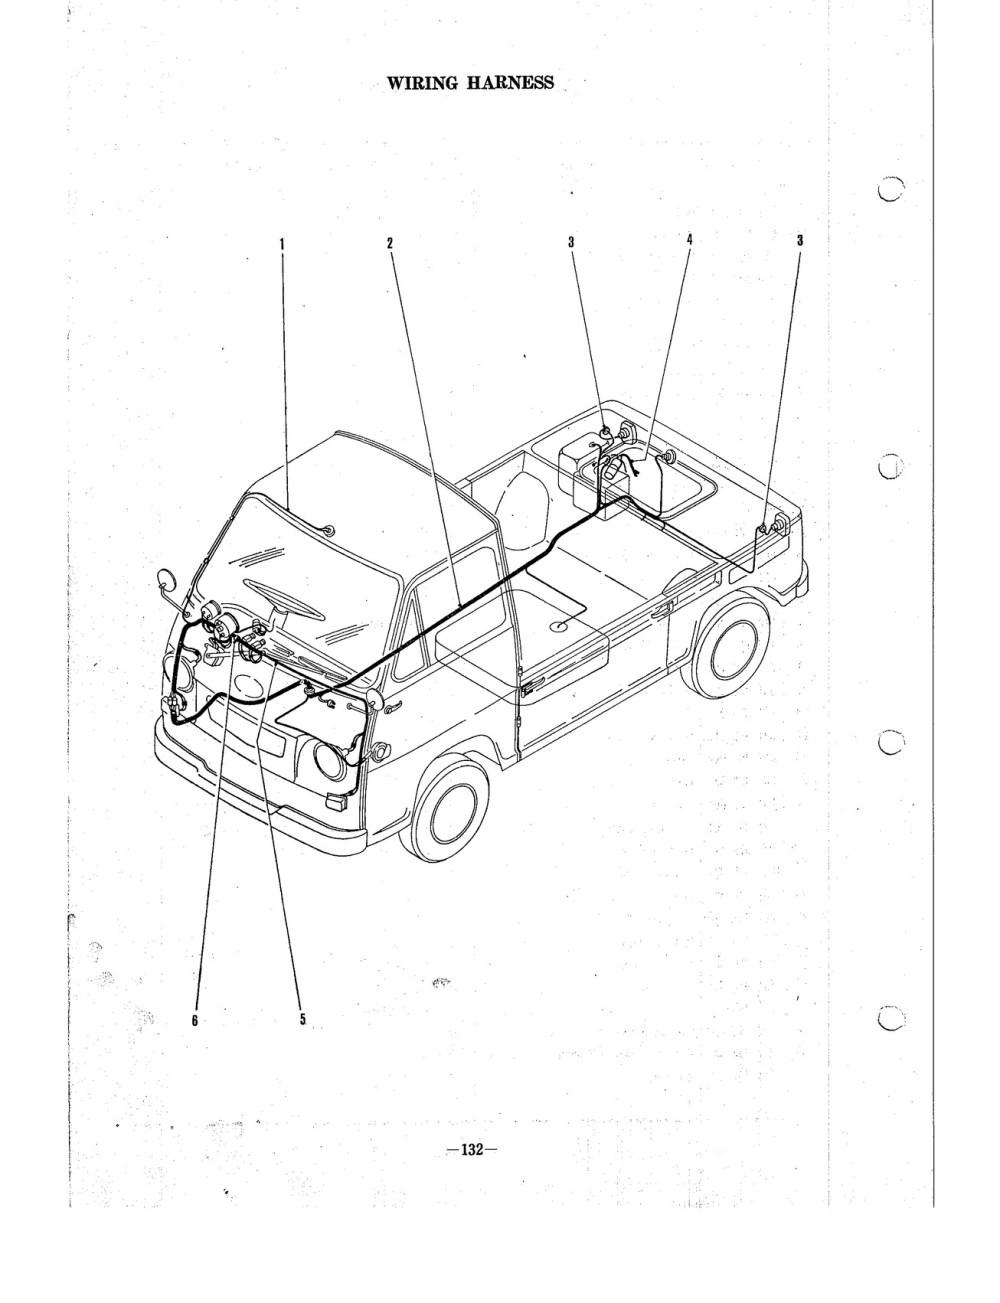 medium resolution of subaru 360 sambar parts 132 littlecartrader little car trader subaru forester wiring diagram subaru 360 wiring diagram